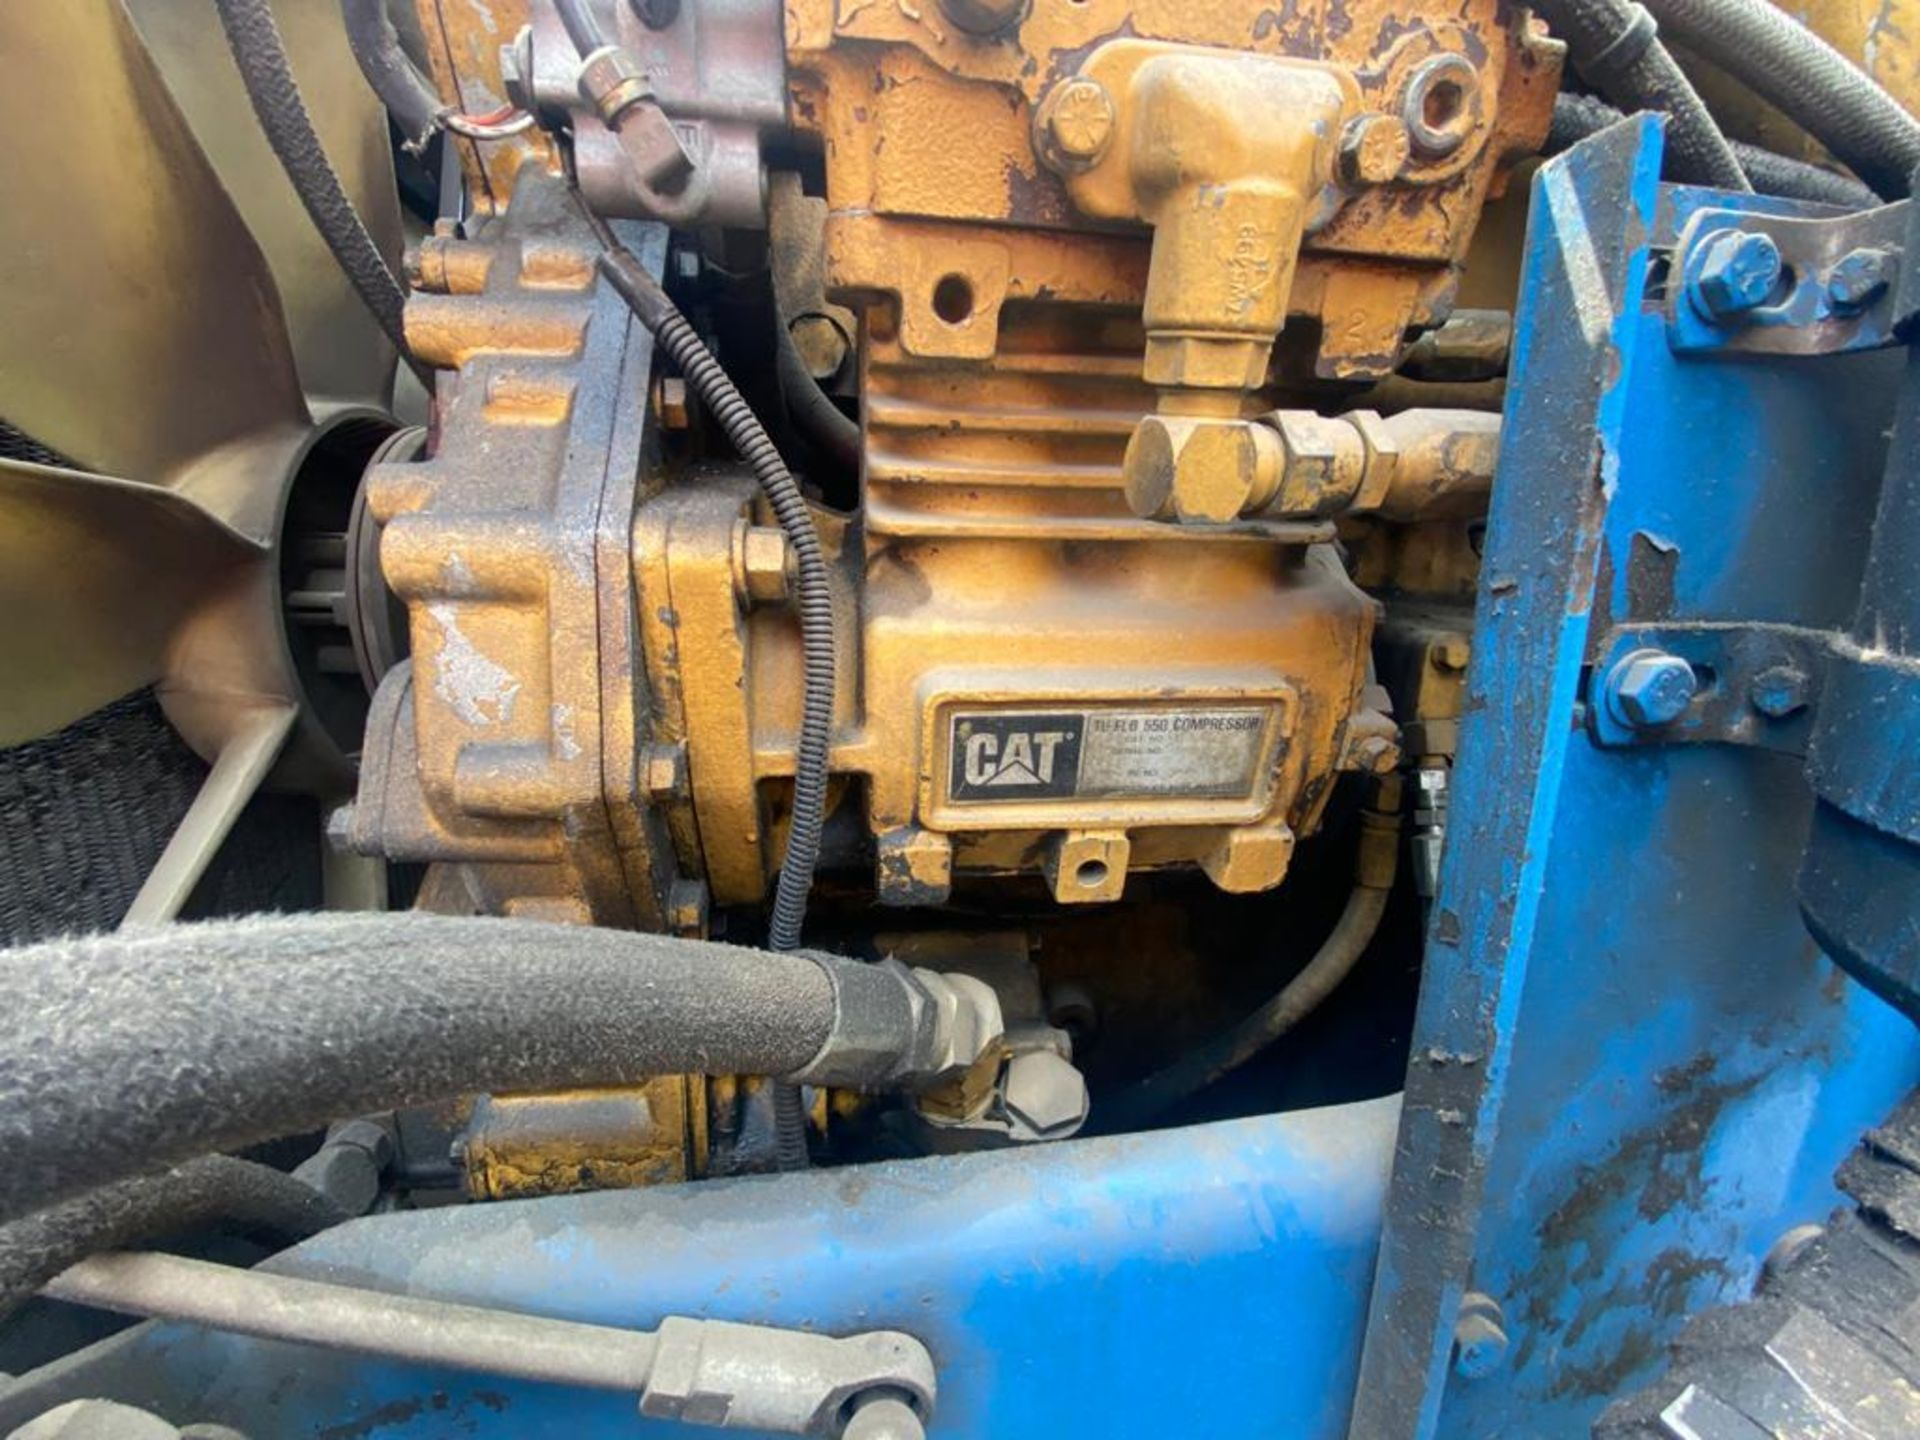 1999 Kenworth Sleeper truck tractor, standard transmission of 18 speeds - Image 56 of 62